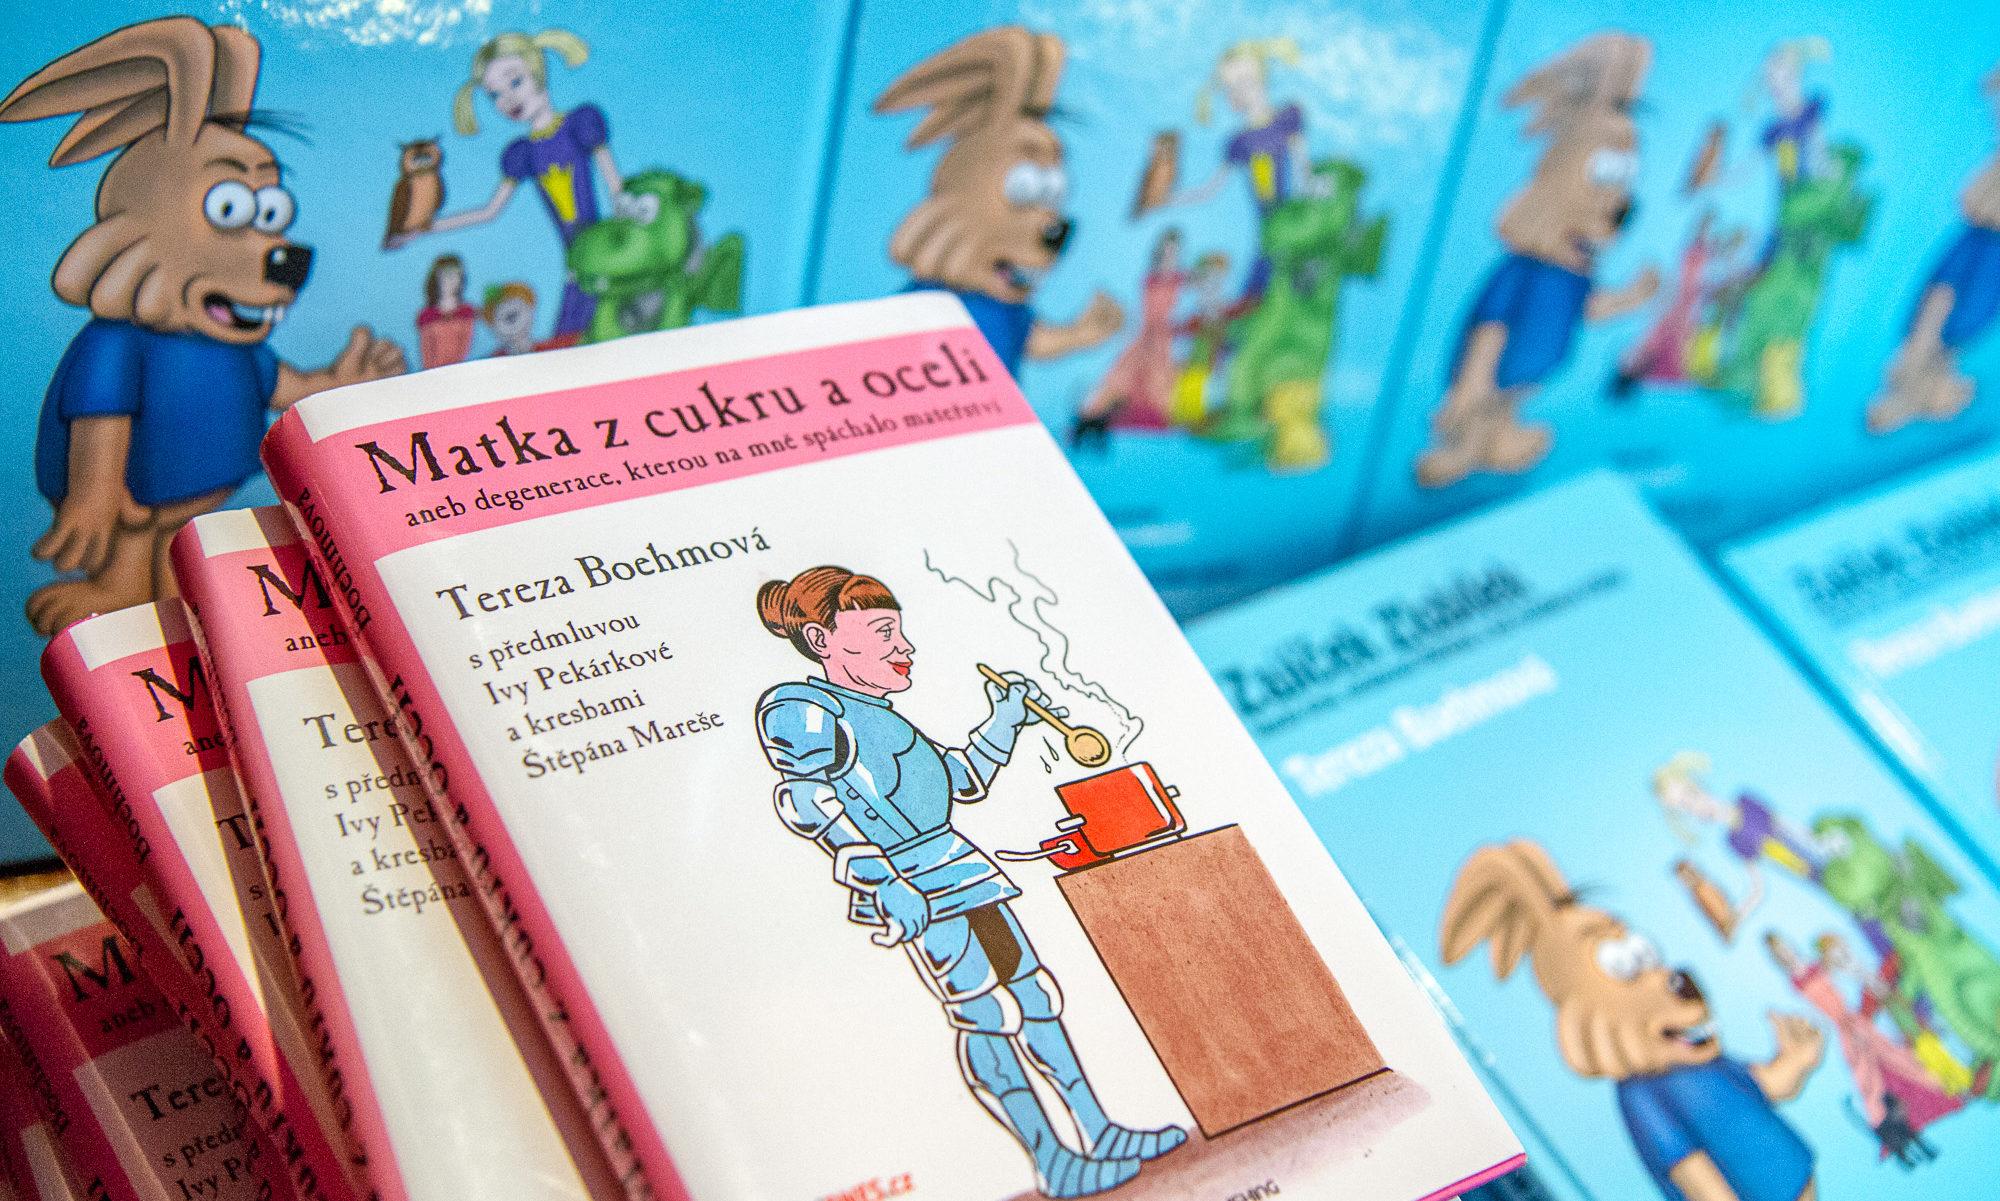 Tereza Boehmová - Knihy